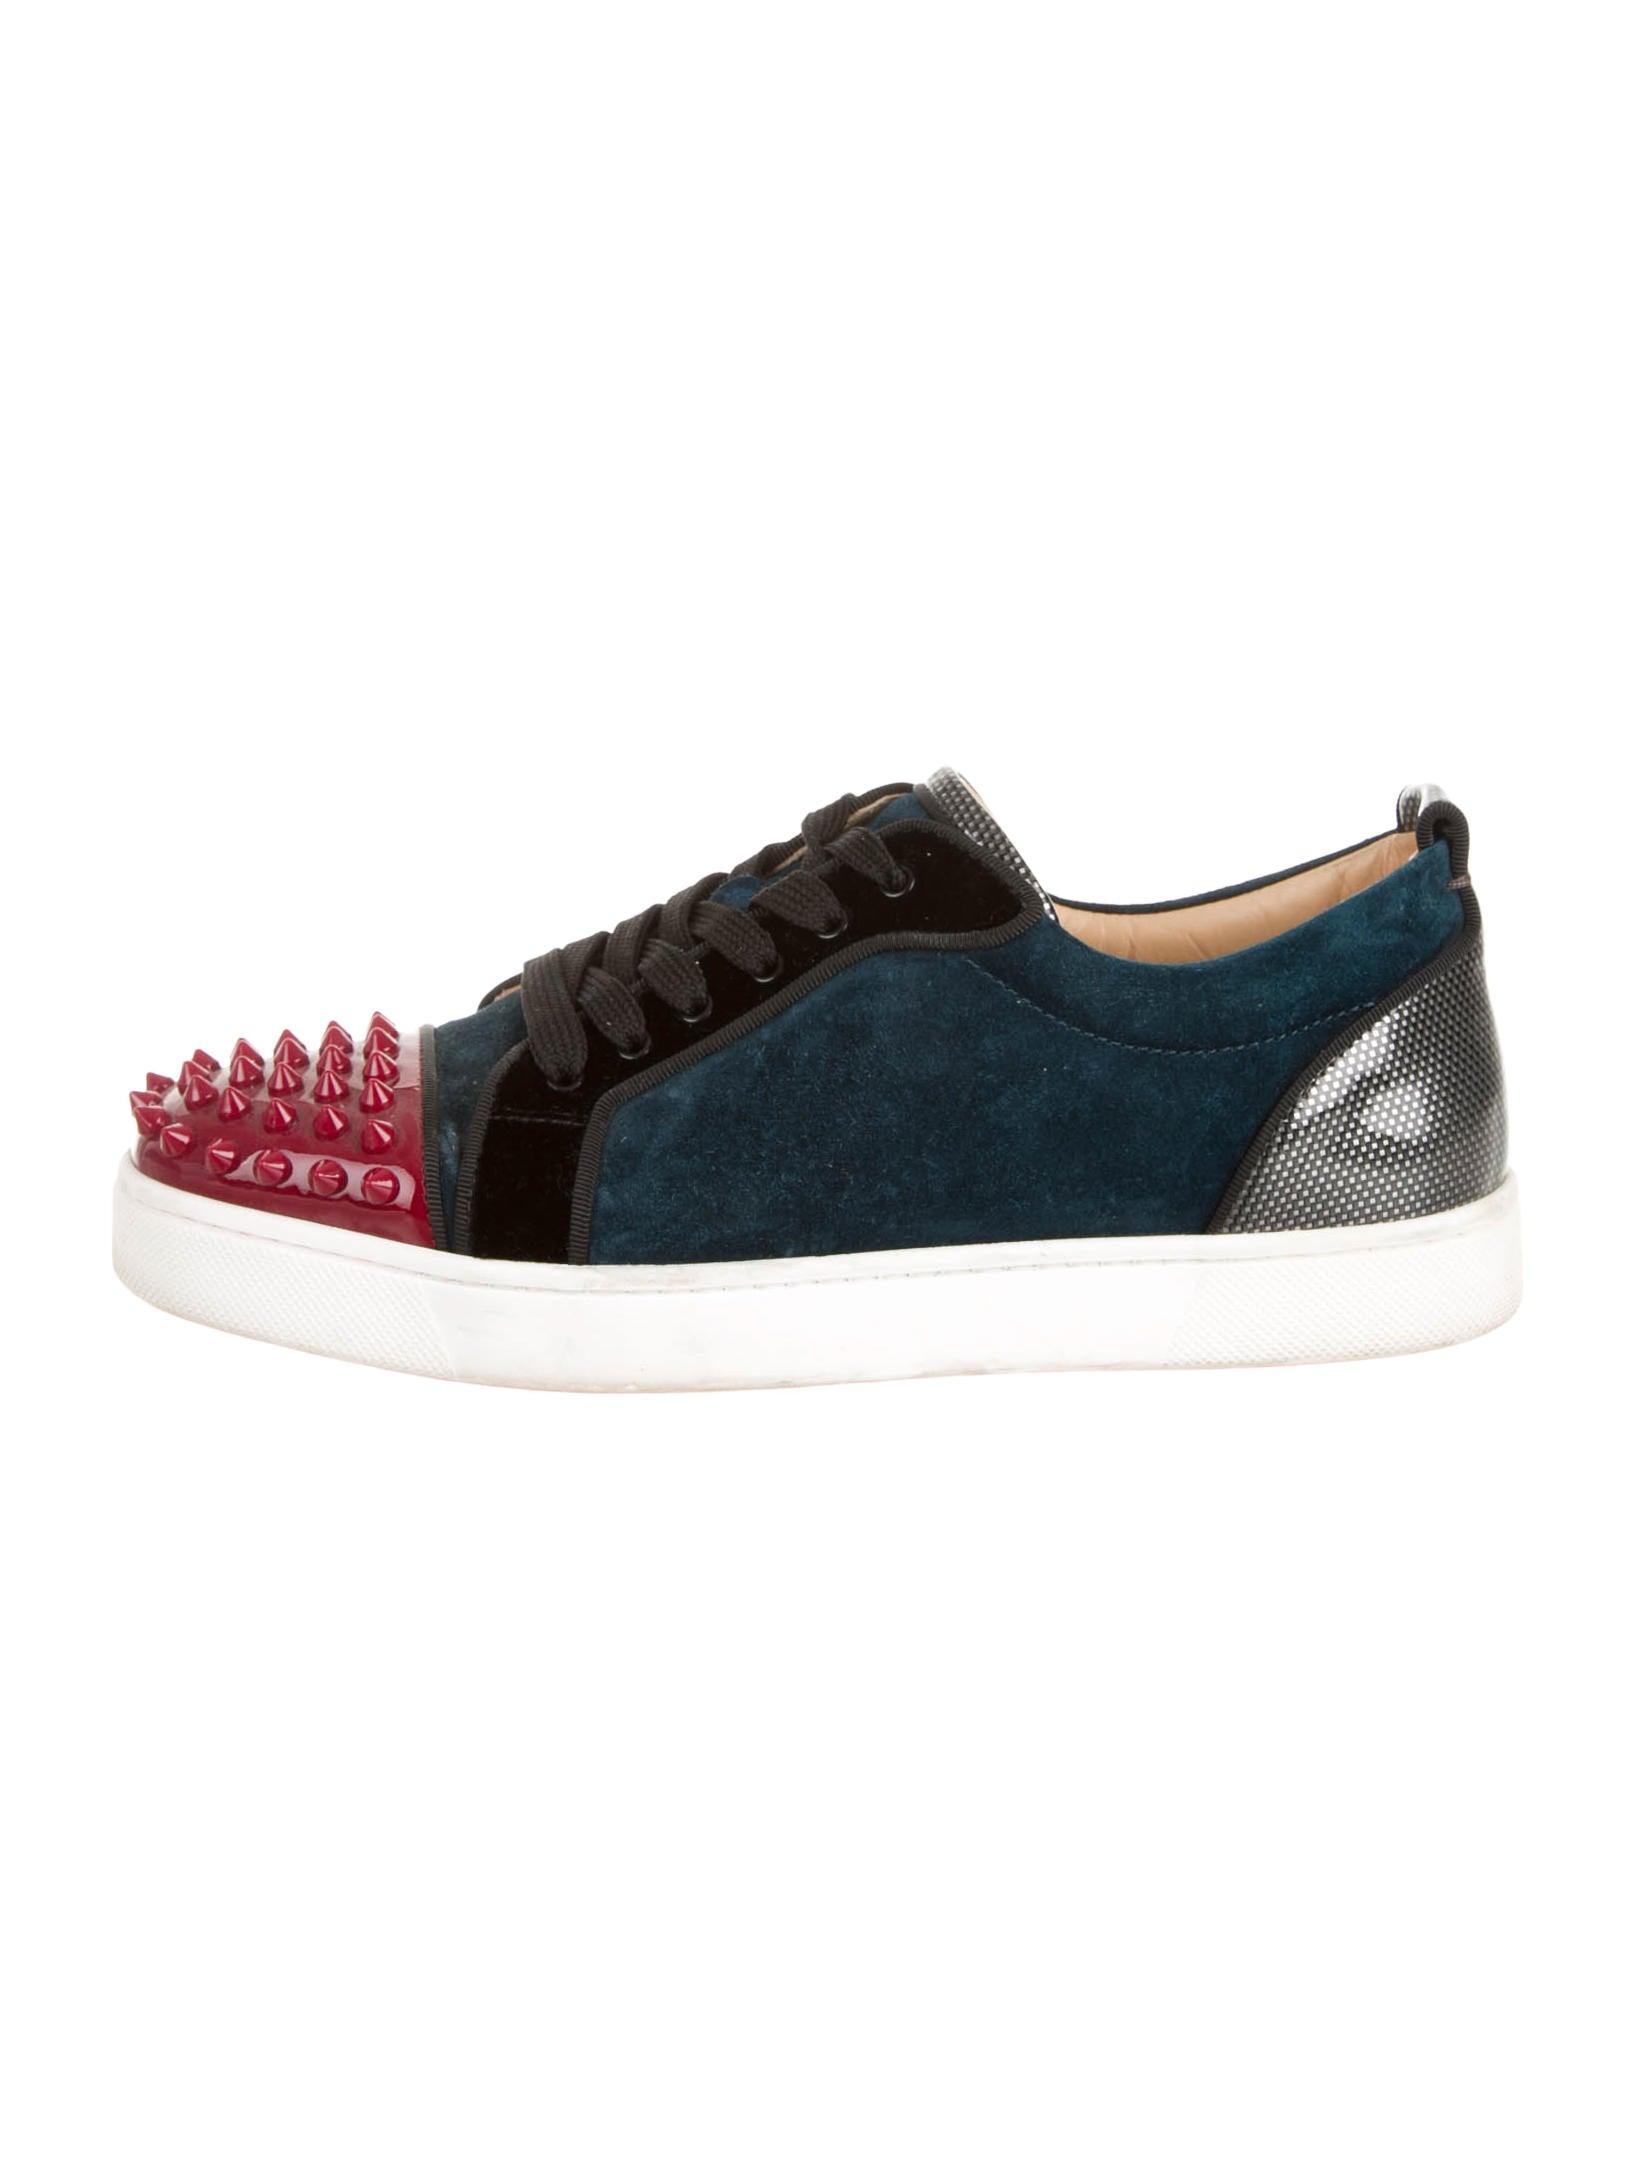 1f23e11e51ed Artesur » christian louboutin round-toe Louis Junior Spike sneakers ...